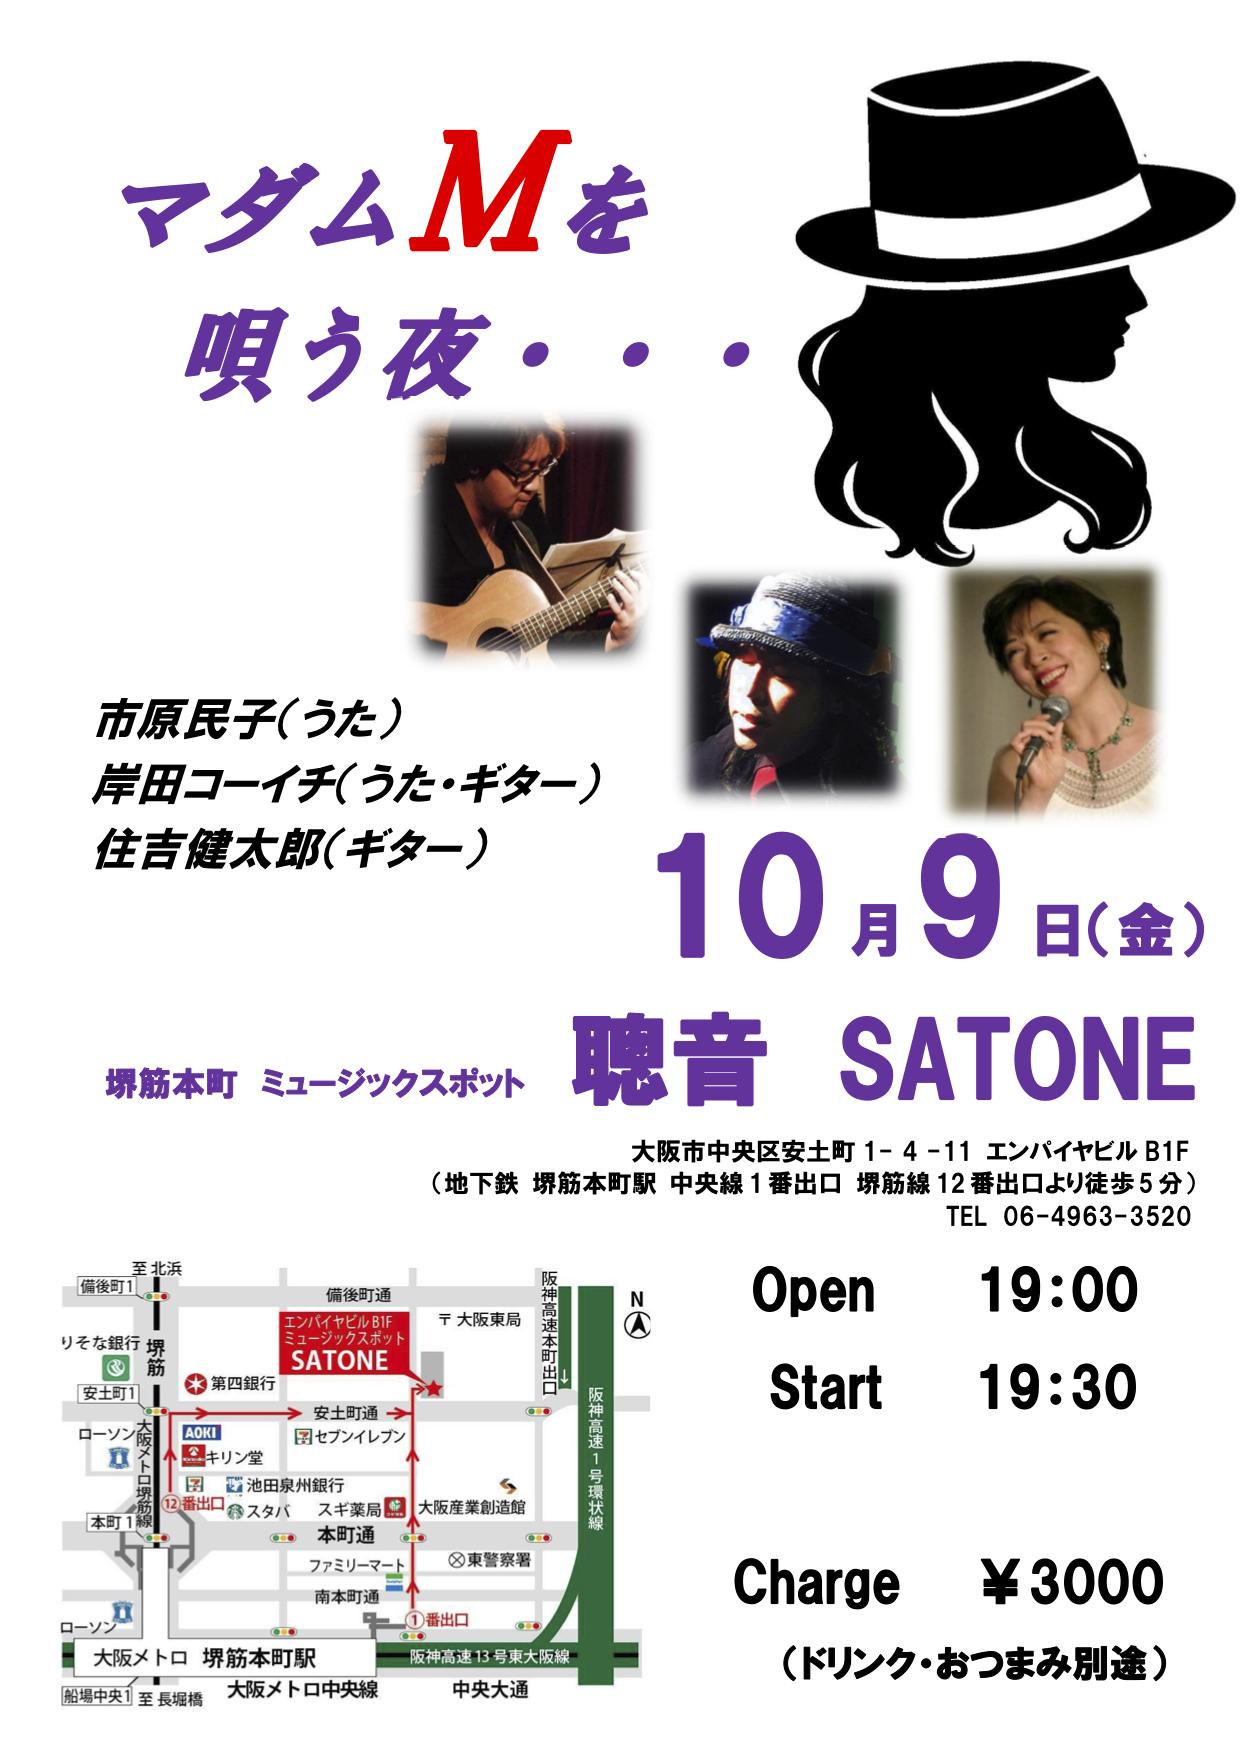 10/9(金)市原 民子  岸田 コーイチ  住吉 健太郎